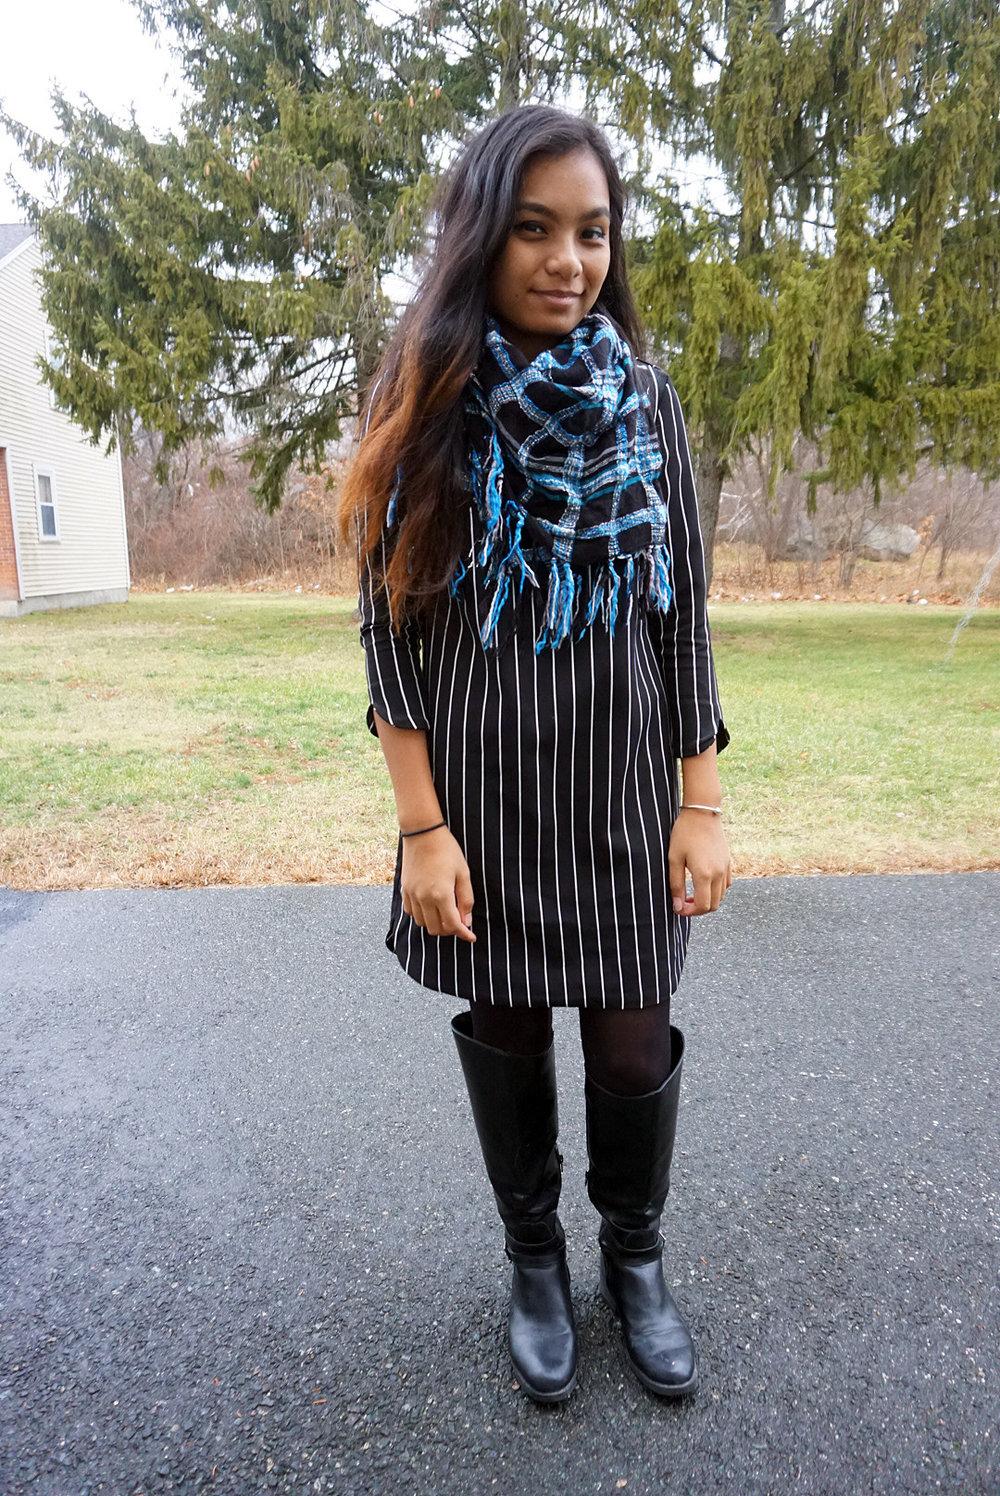 Black-White-Striped-Dress-Blogger-Style-LINDATENCHITRAN-17-1080x1616.jpg